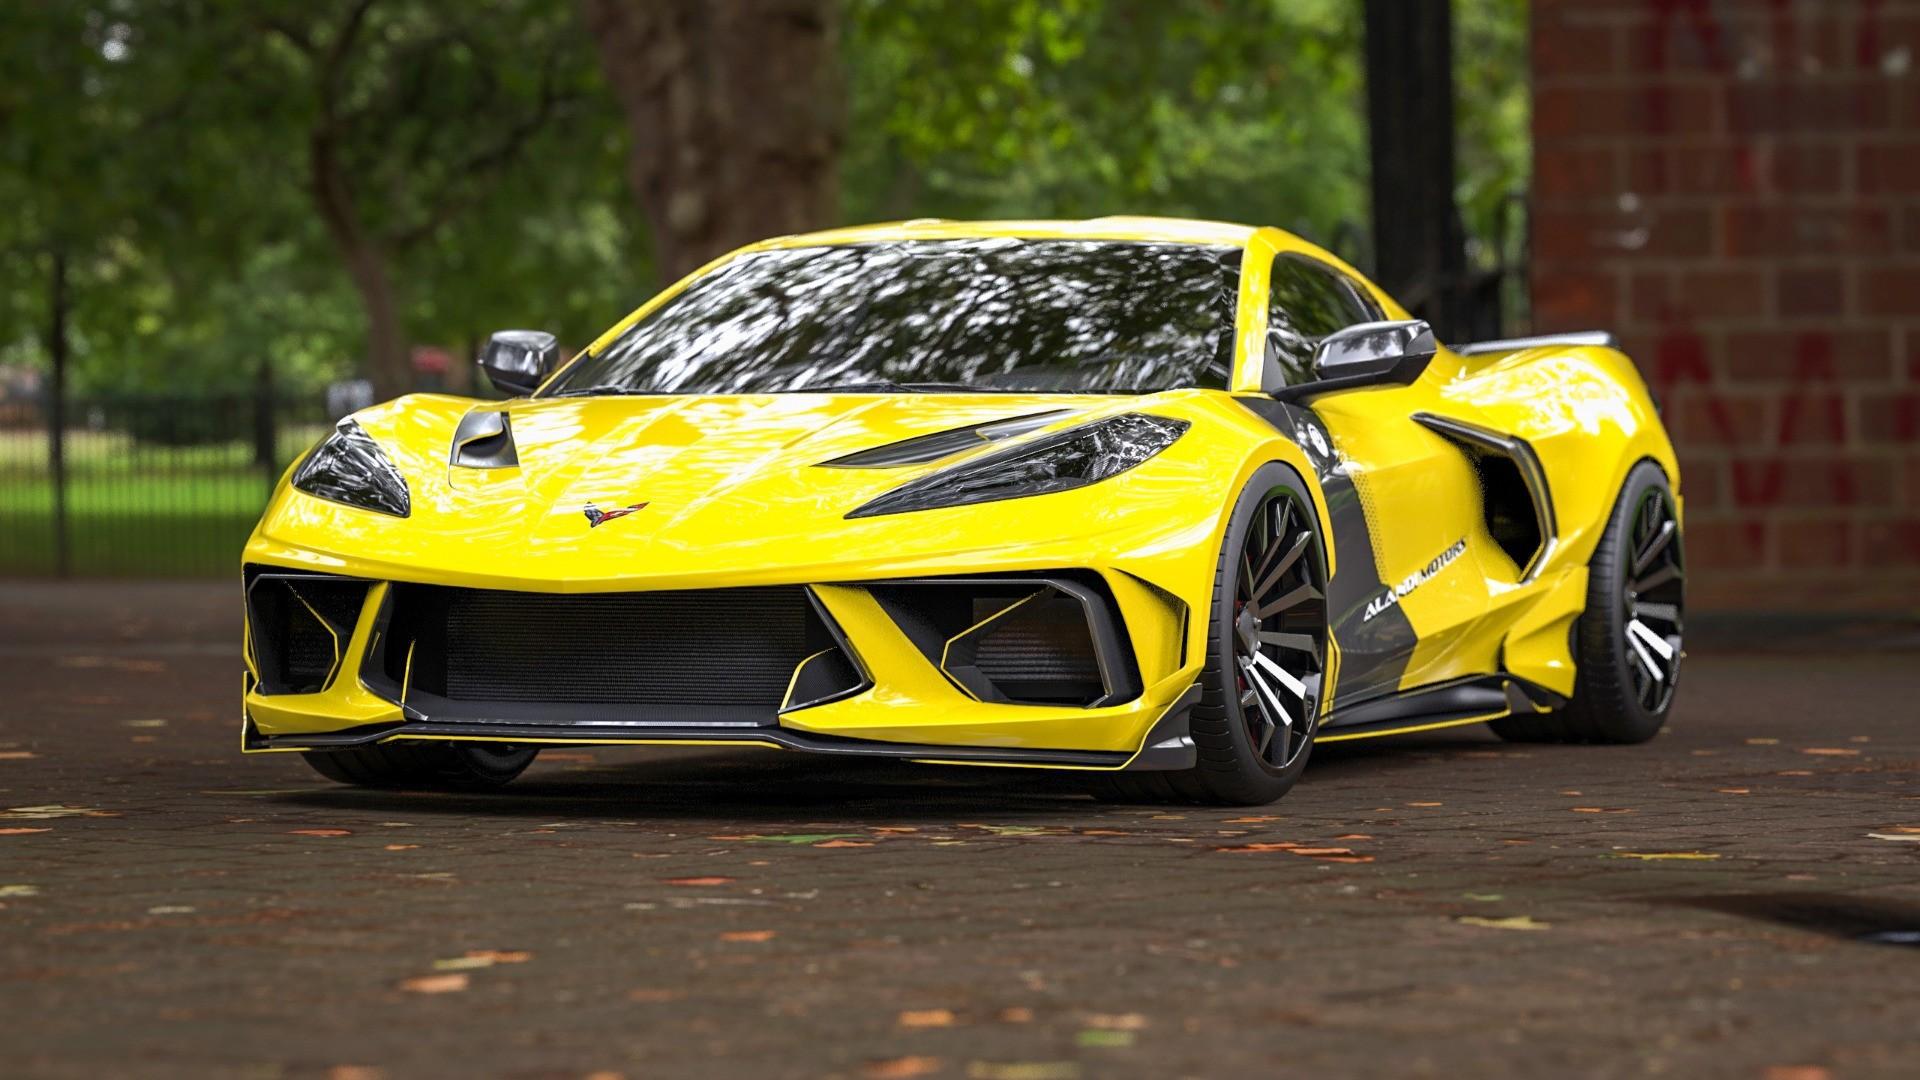 Chevrolet-Corvette-Centurion-by-Alandi-Motors-13